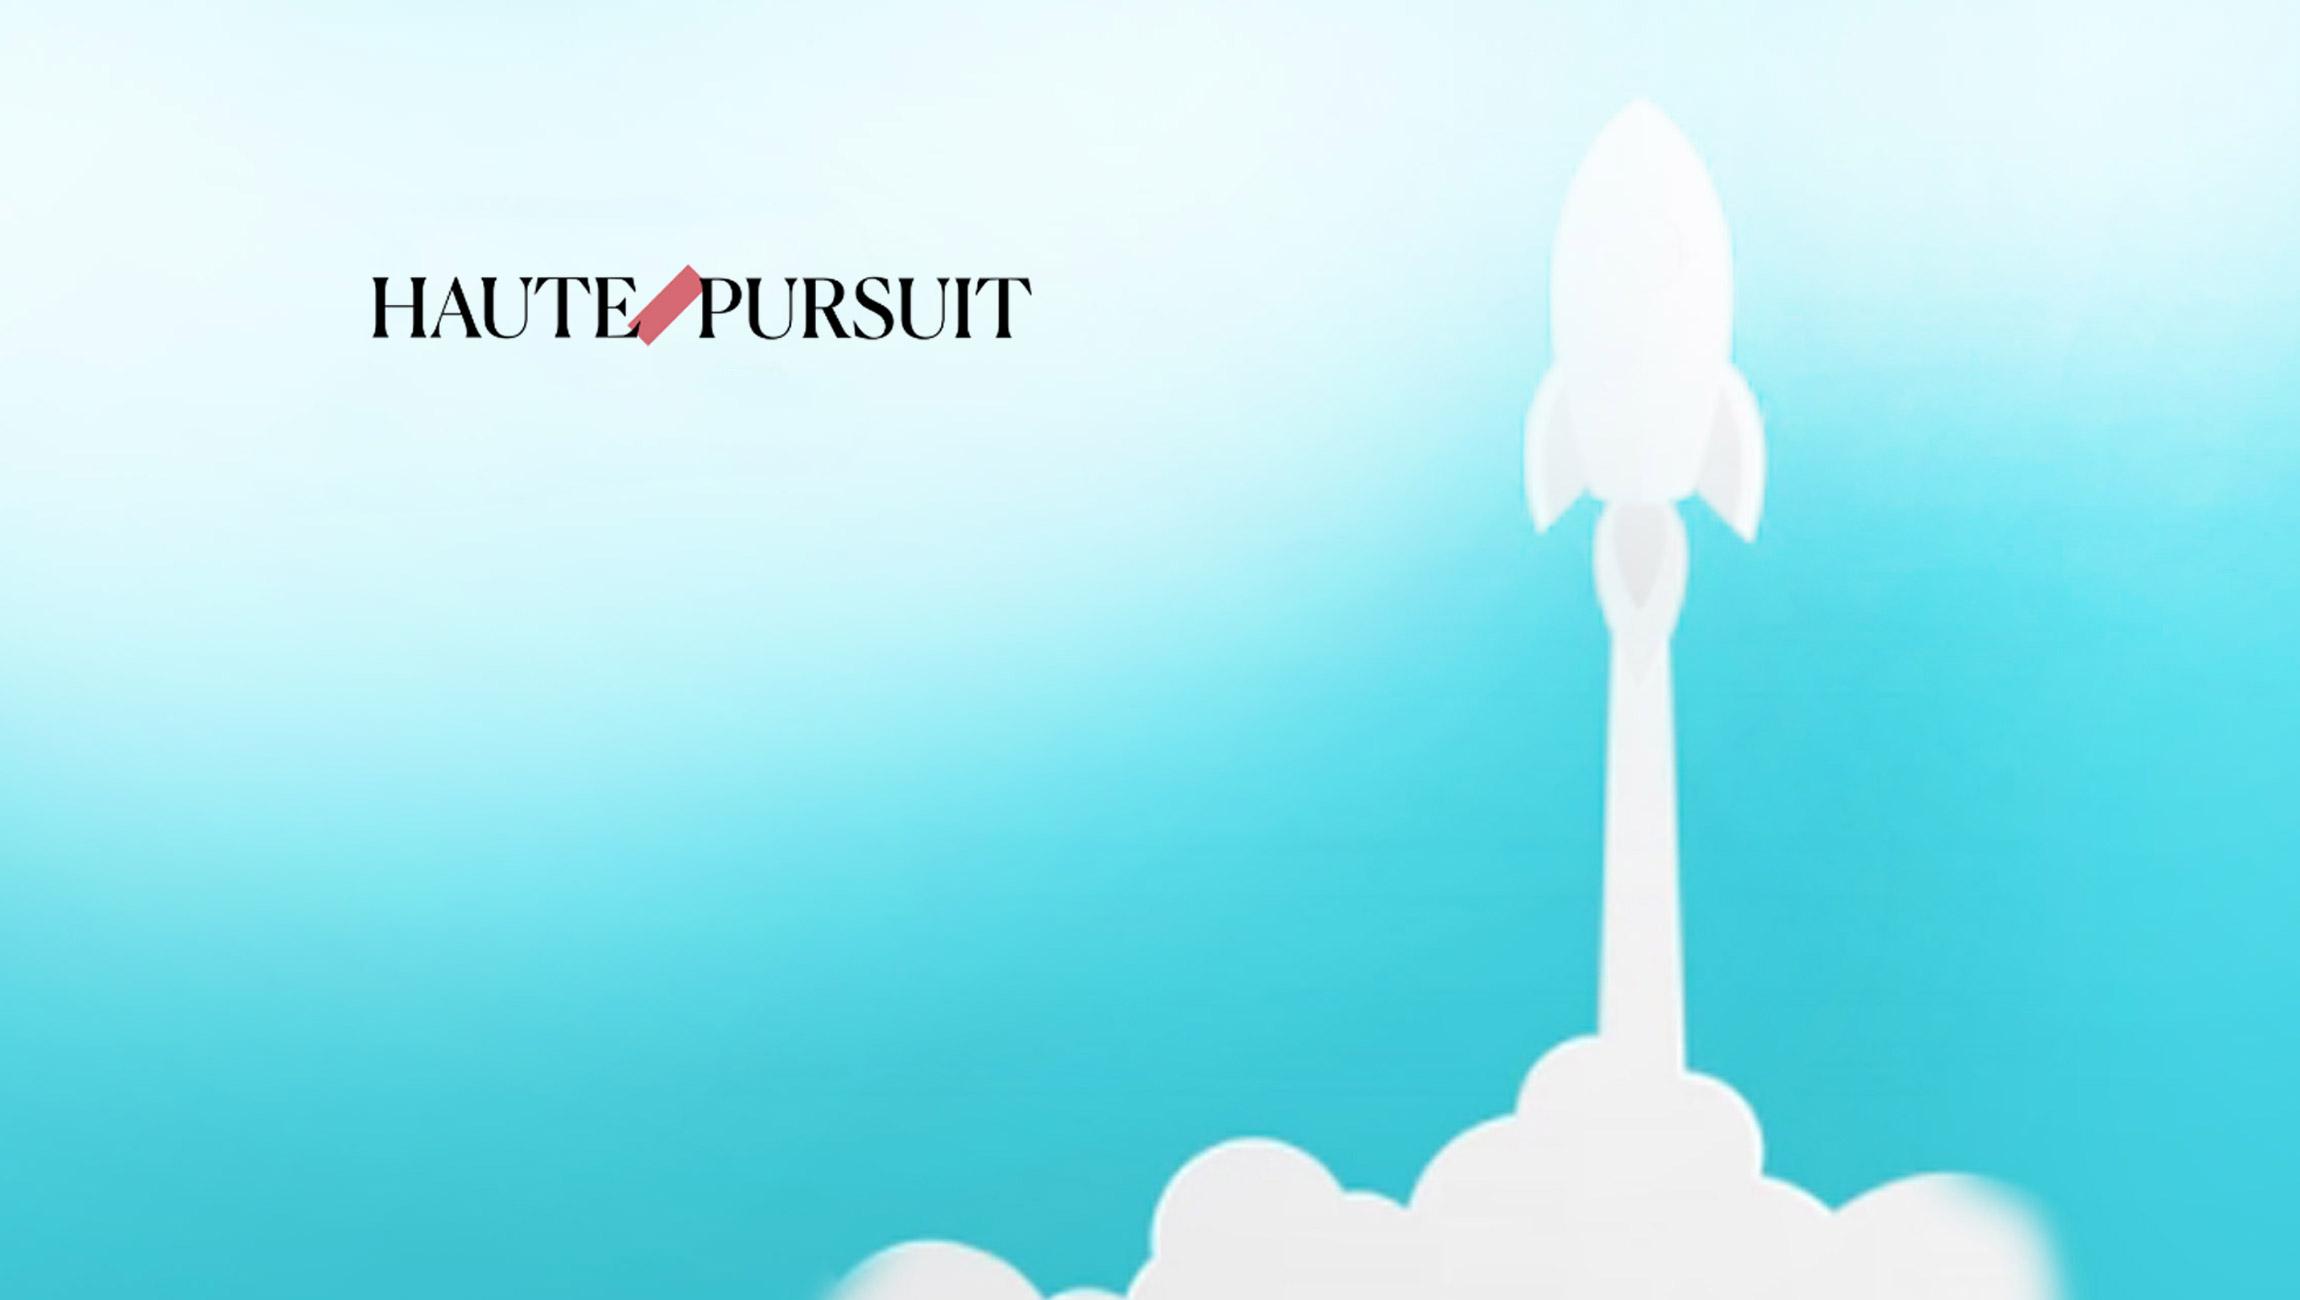 Haute-Pursuit-Launches-Mobile-Browser-Shopping-Assistant-Alongside-Apple's-iOS15-Release